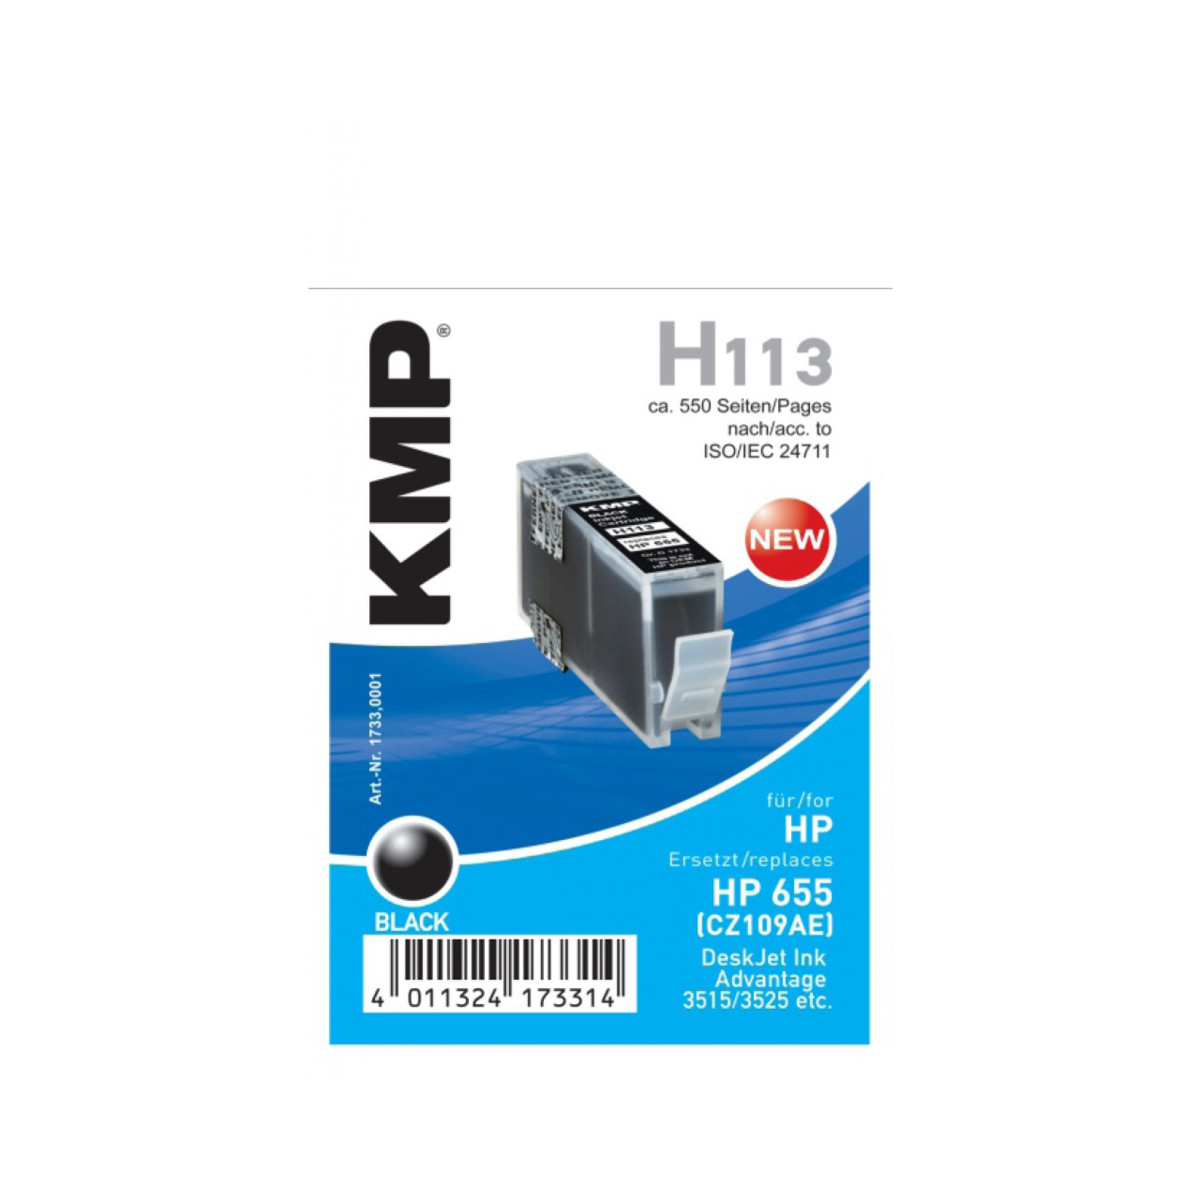 Cartridge HP 655, HP CZ109AE, KMP - kompatibilní (Černá)